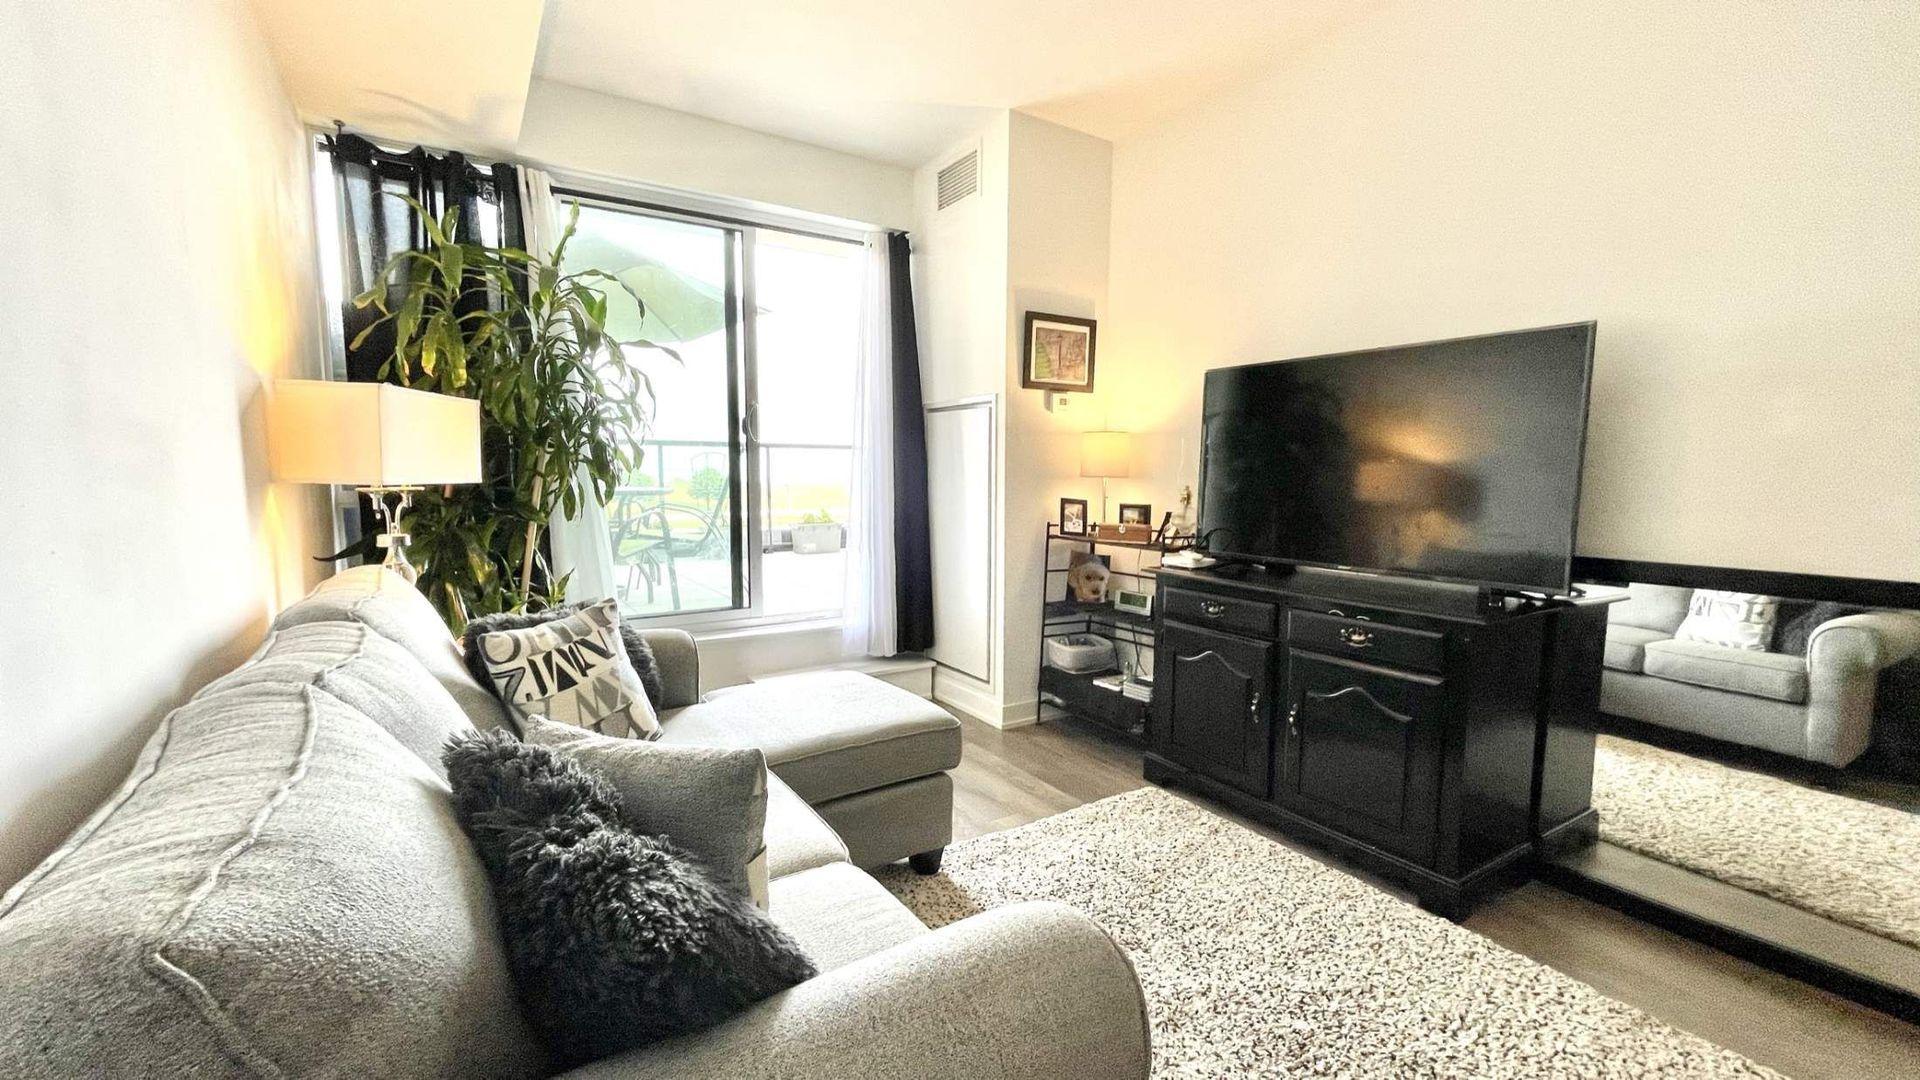 livingroom2 at # 215 - 550 North Service Road, Grimsby